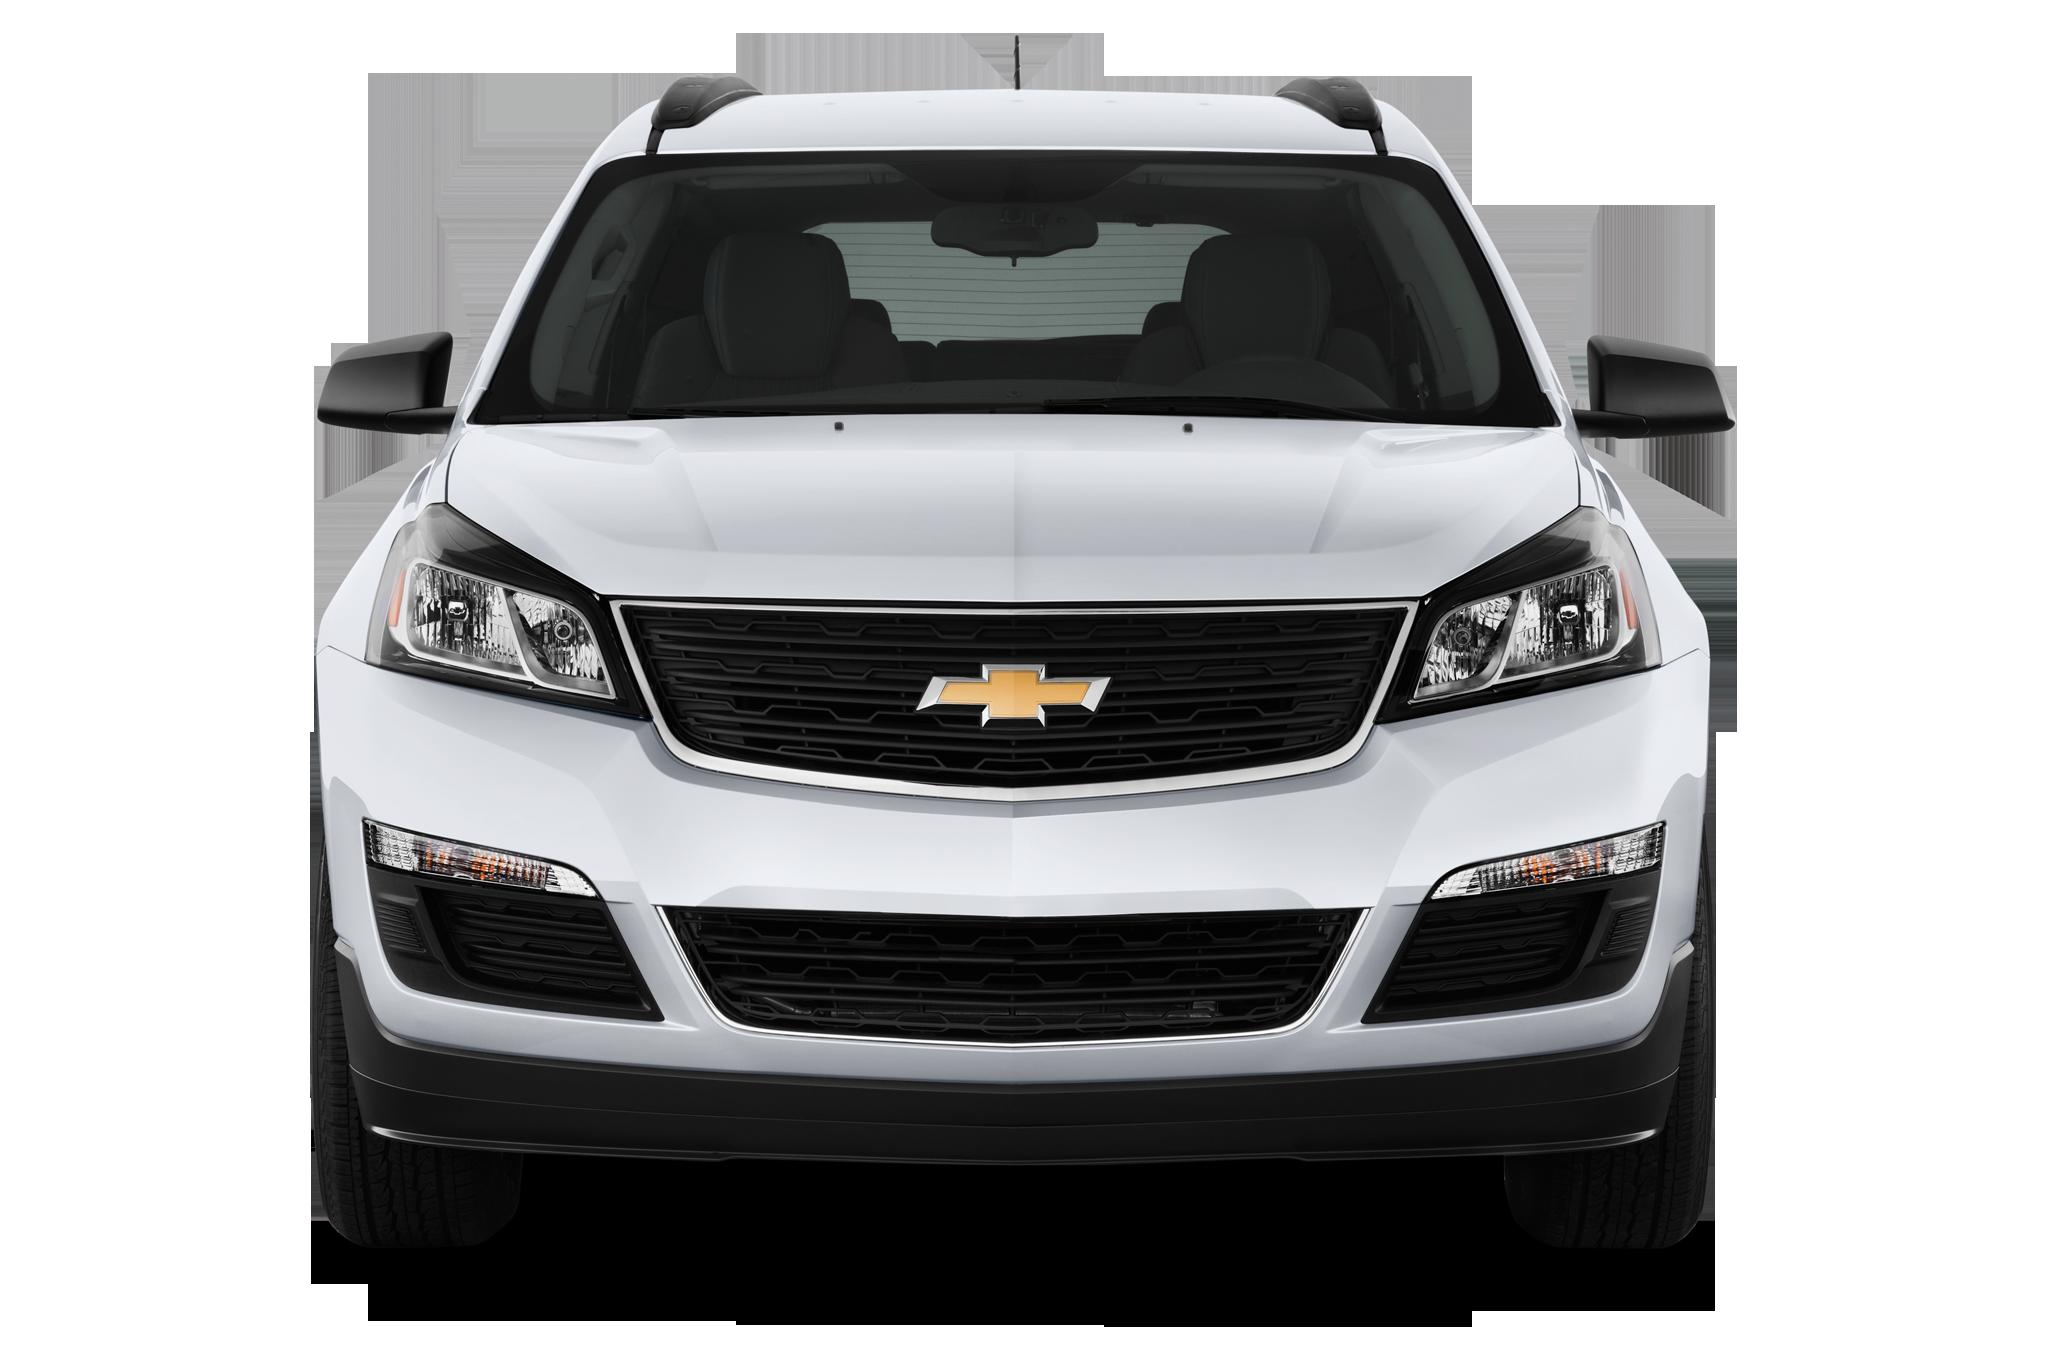 2018 Chevrolet Traverse Msrp | Upcoming Chevrolet